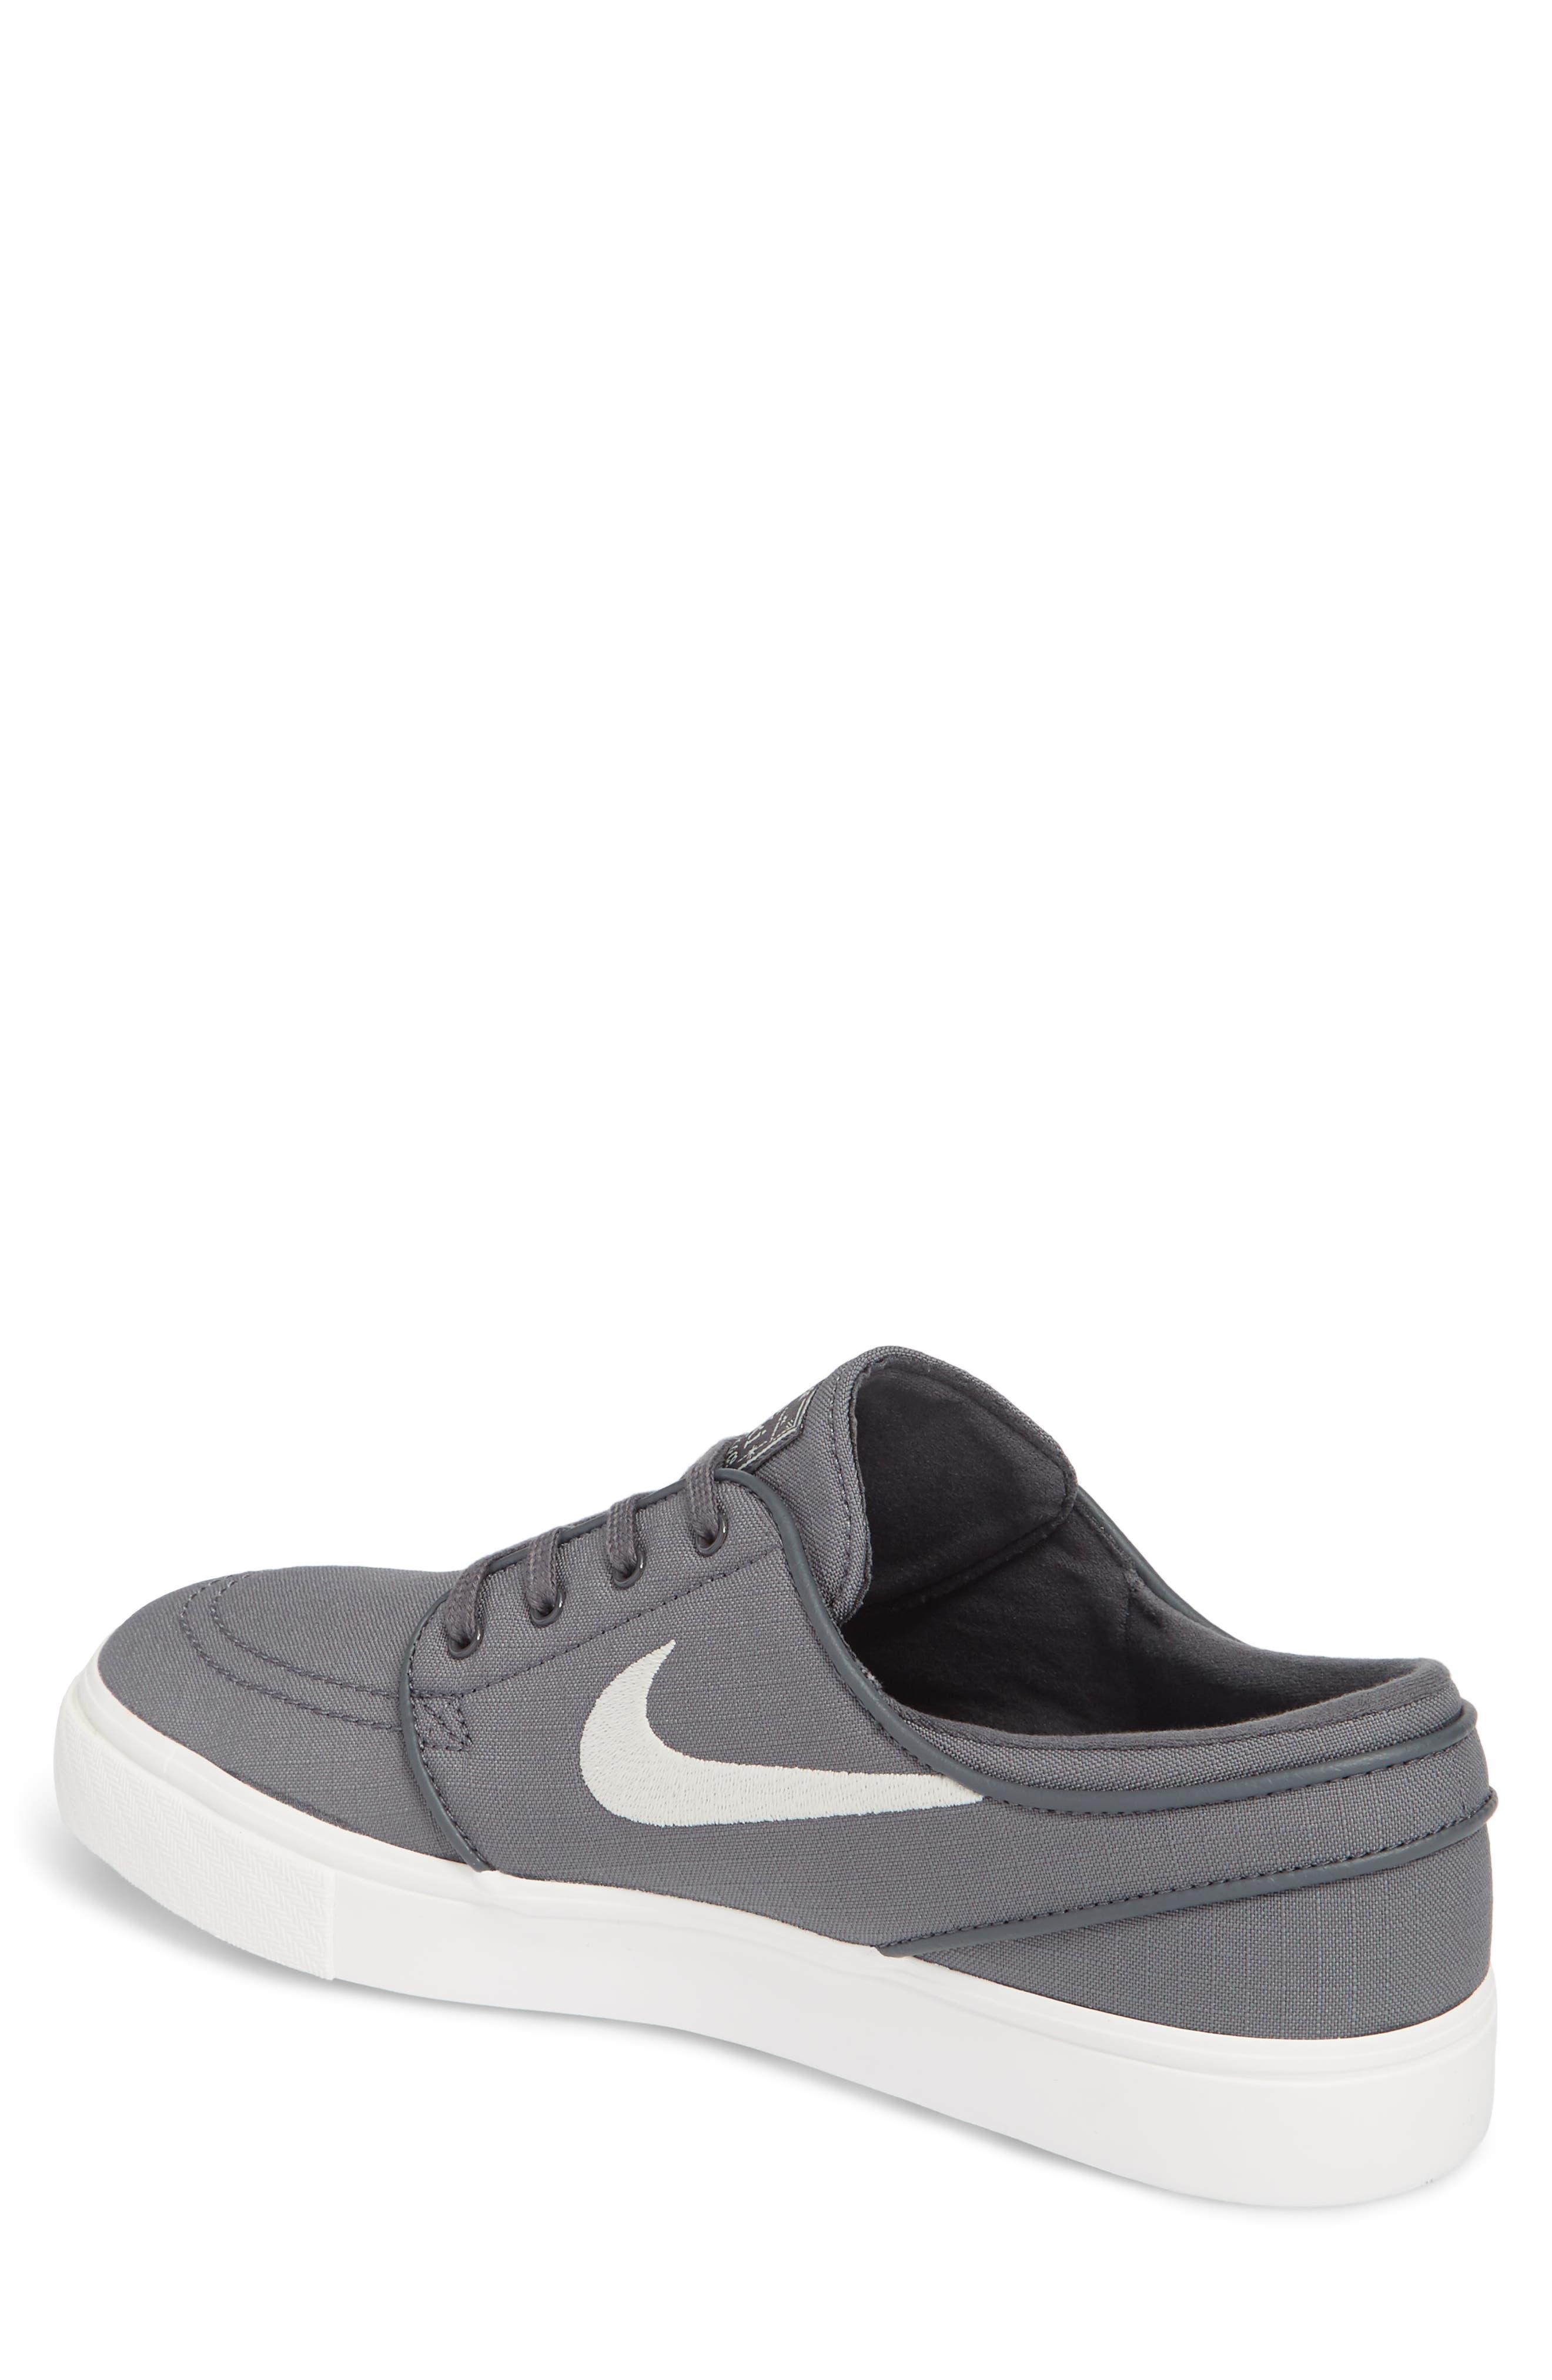 'Zoom - Stefan Janoski SB' Canvas Skate Shoe,                             Alternate thumbnail 2, color,                             Dark Grey/ Bone/ White/ Black